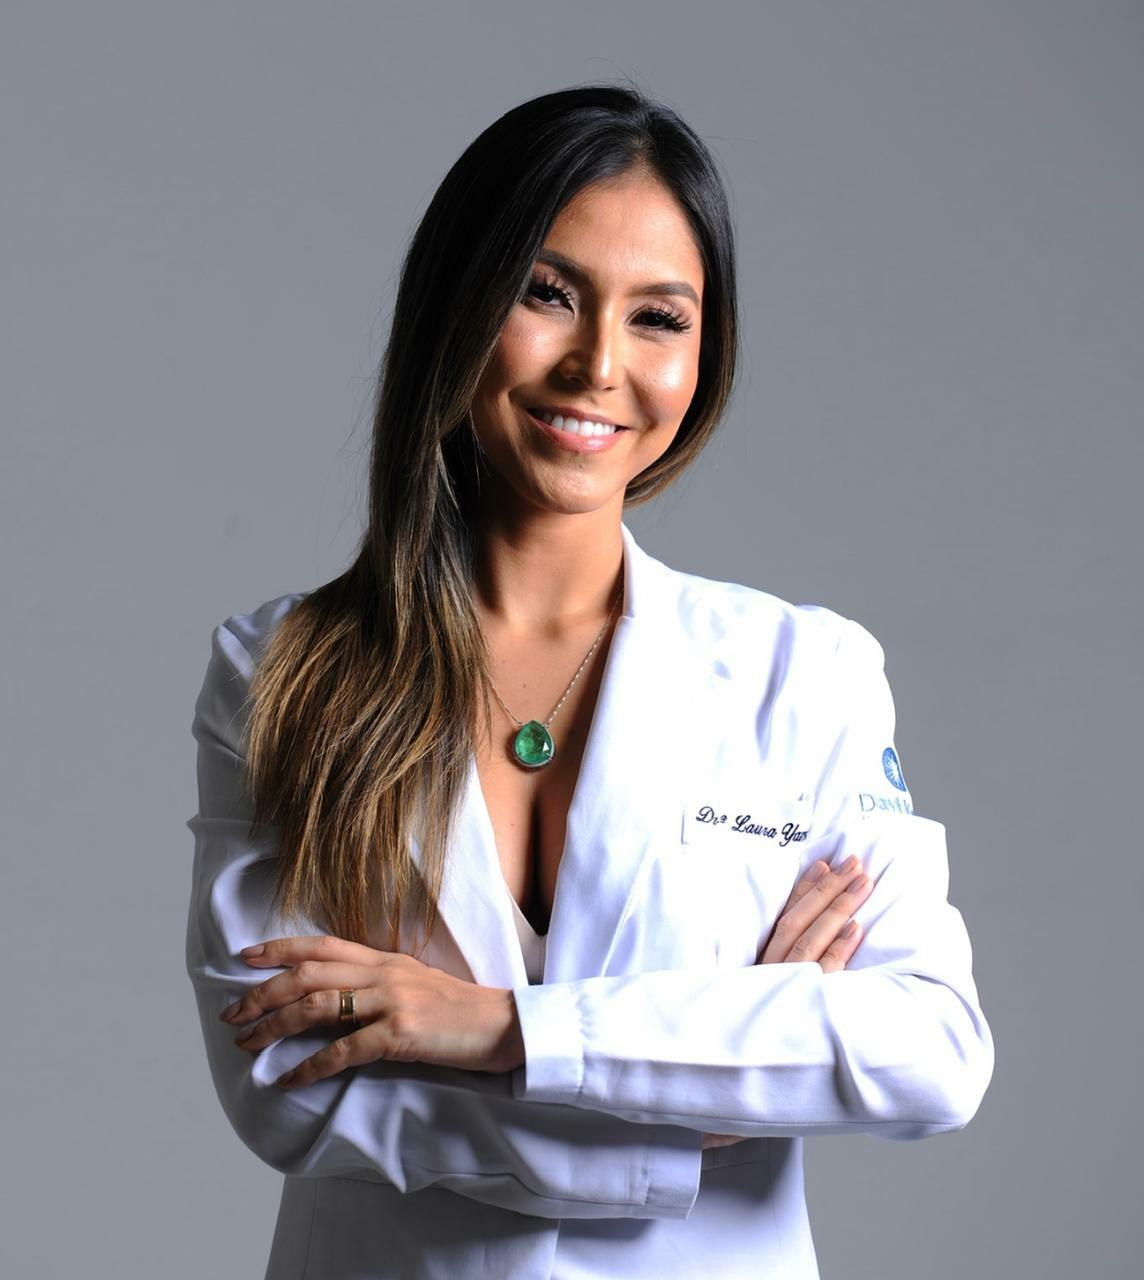 Laura Yamagata Soares De Sá